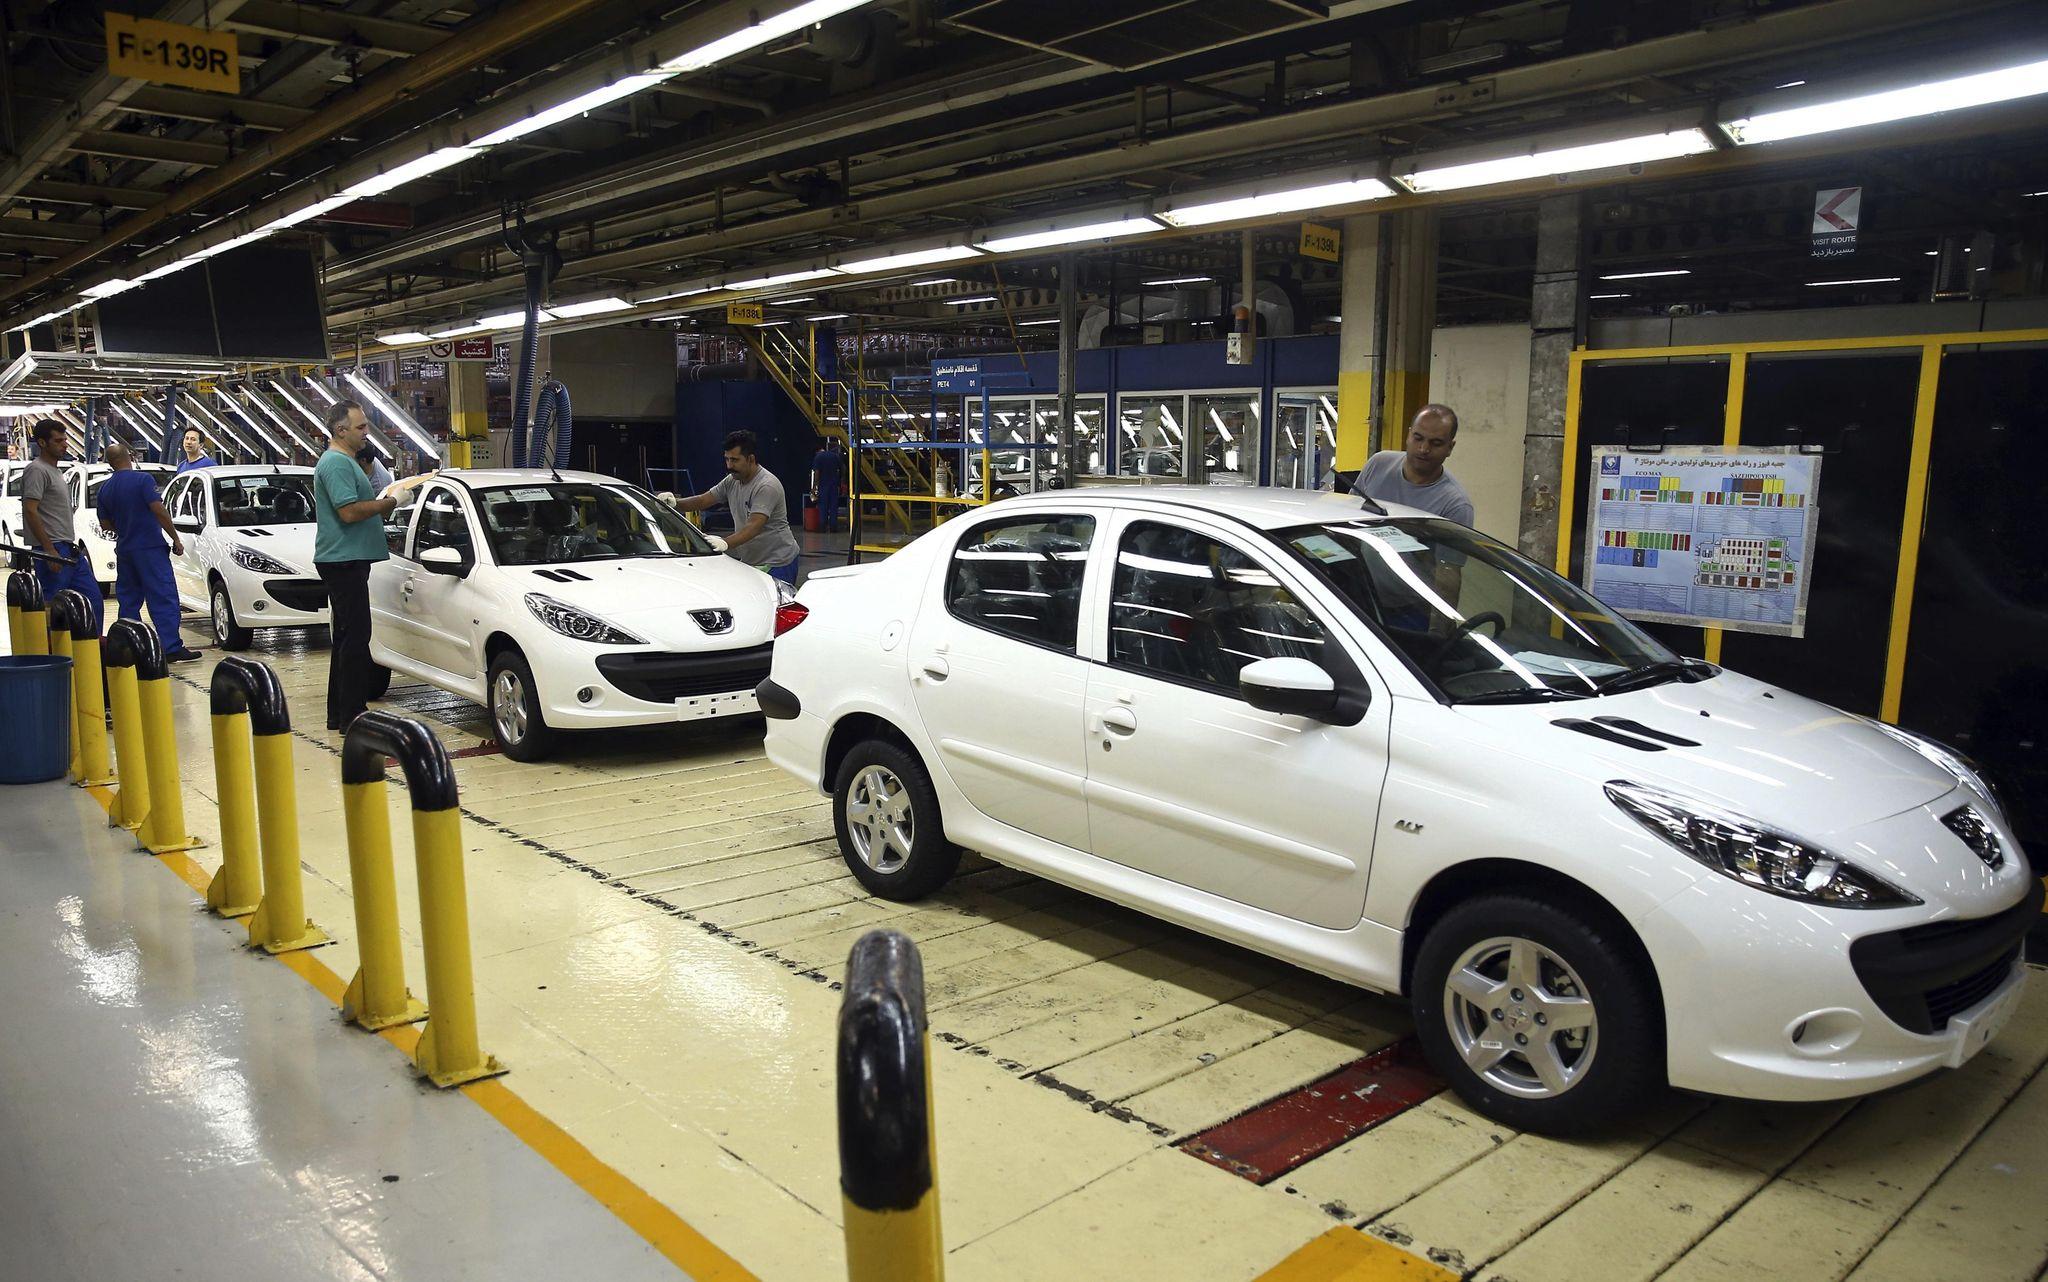 Iran's domestic car market stalls as nuclear deal falters - Washington Times